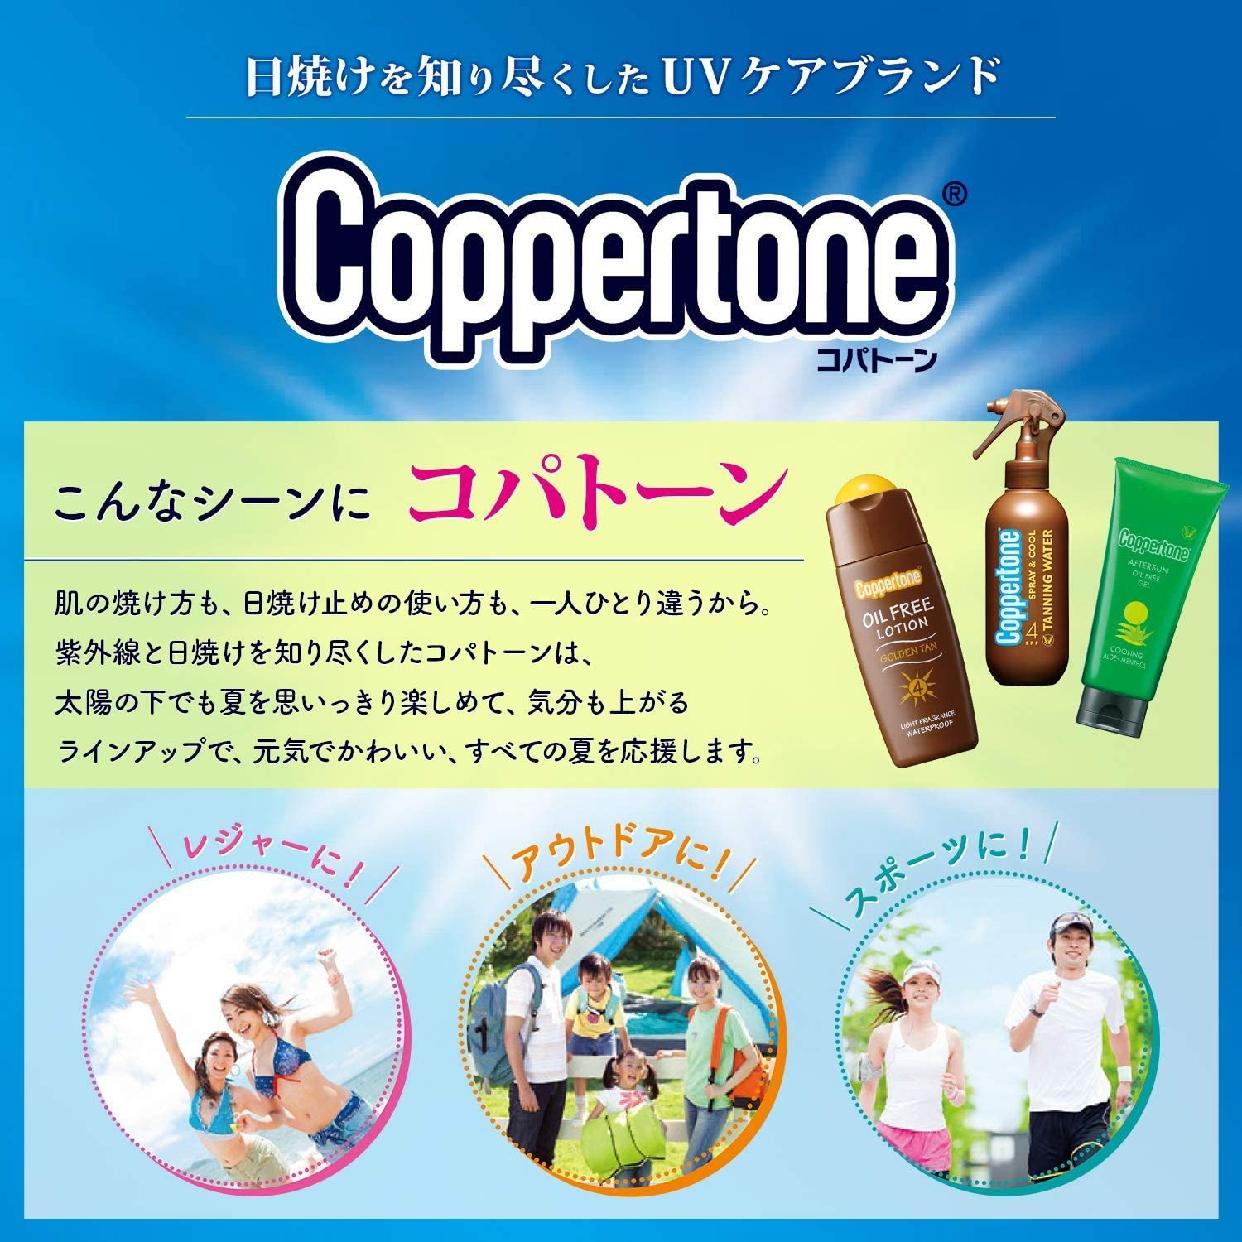 Coppertone(コパトーン) タンニングウォーター SPF2の商品画像3